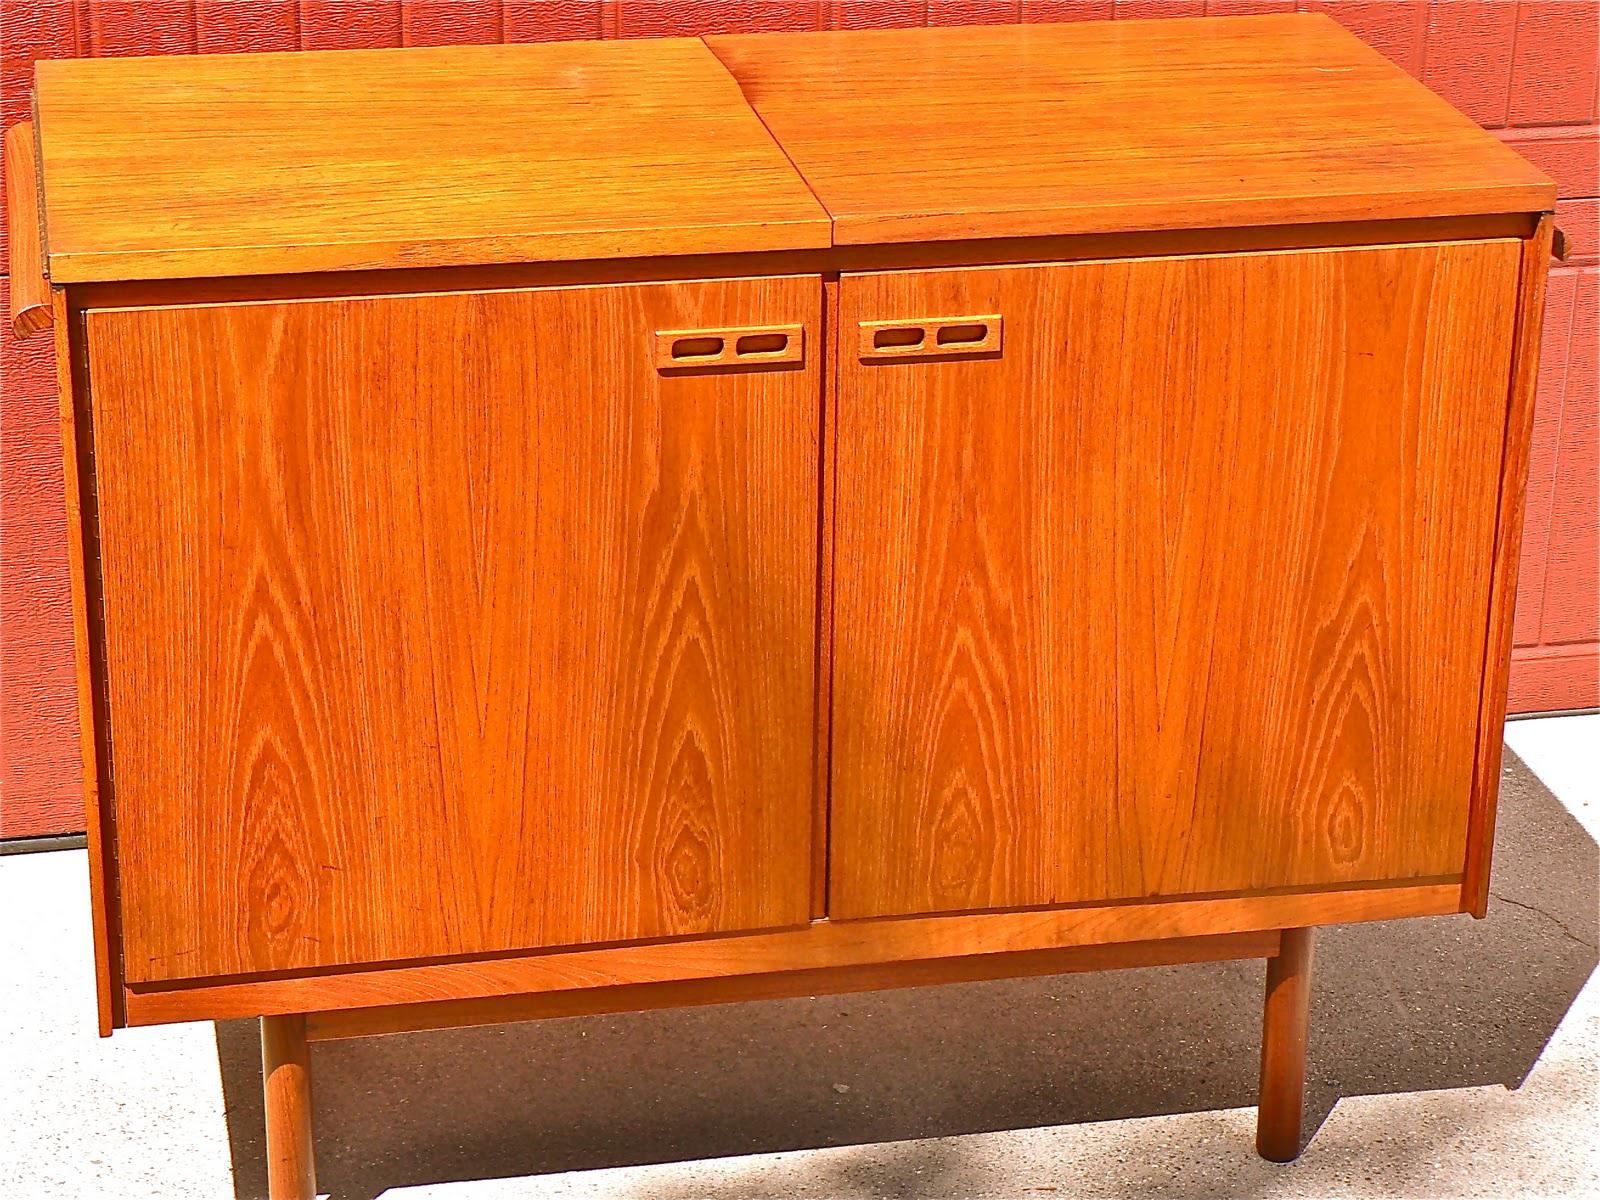 Laduke antiques and 20th century design danish modern for Danish modern la